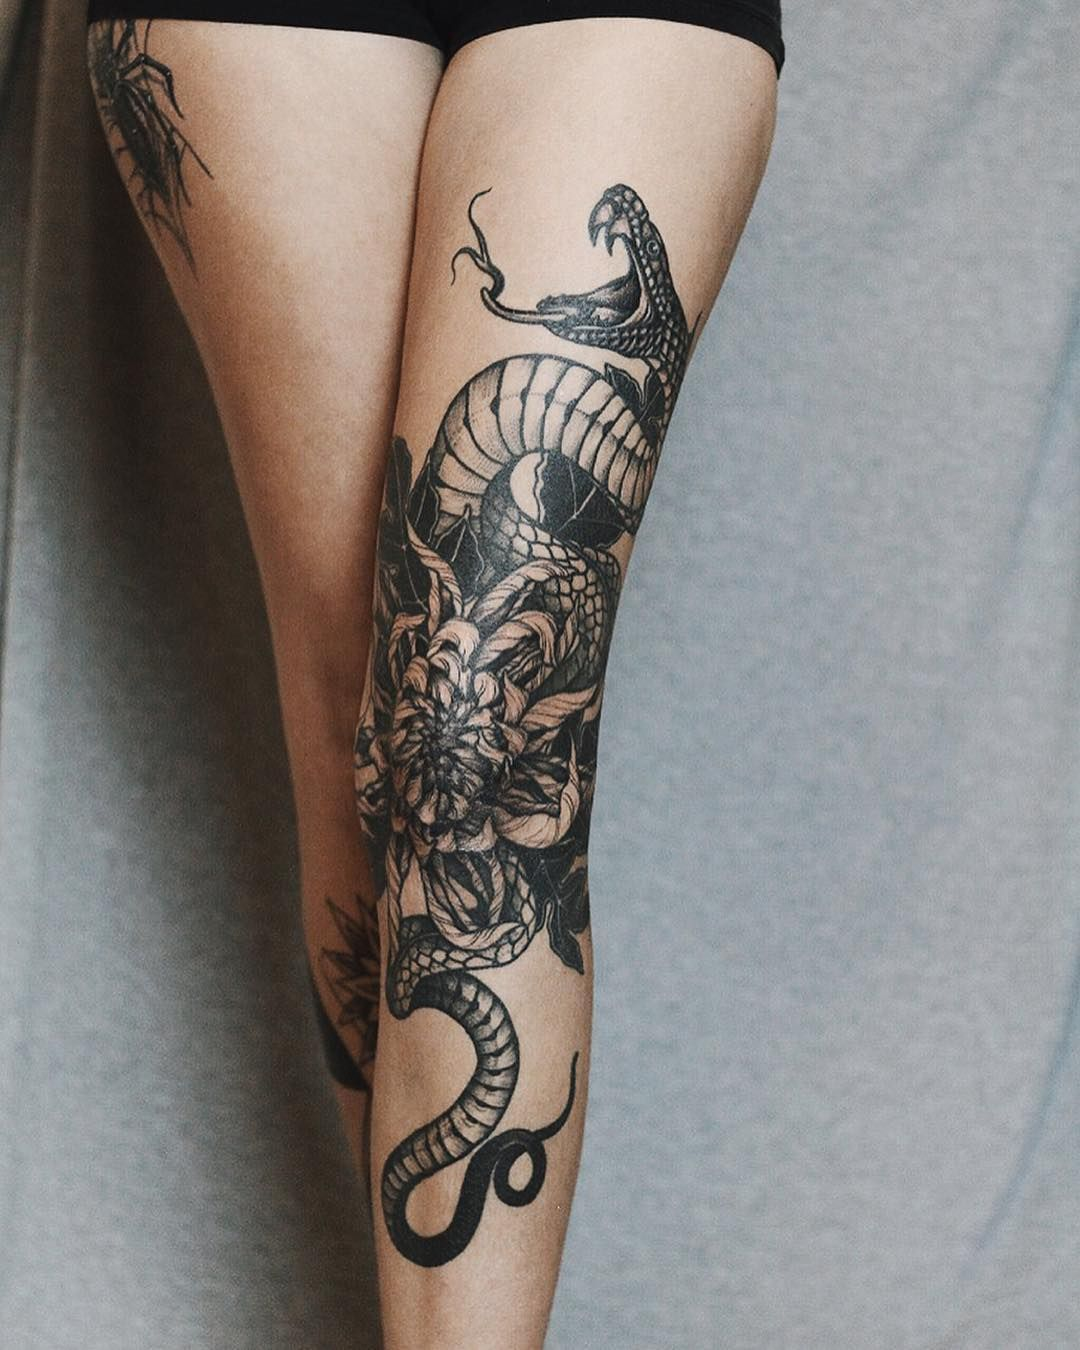 35 Amazing Rattlesnake Tattoo Designs Ideas // September, 2020